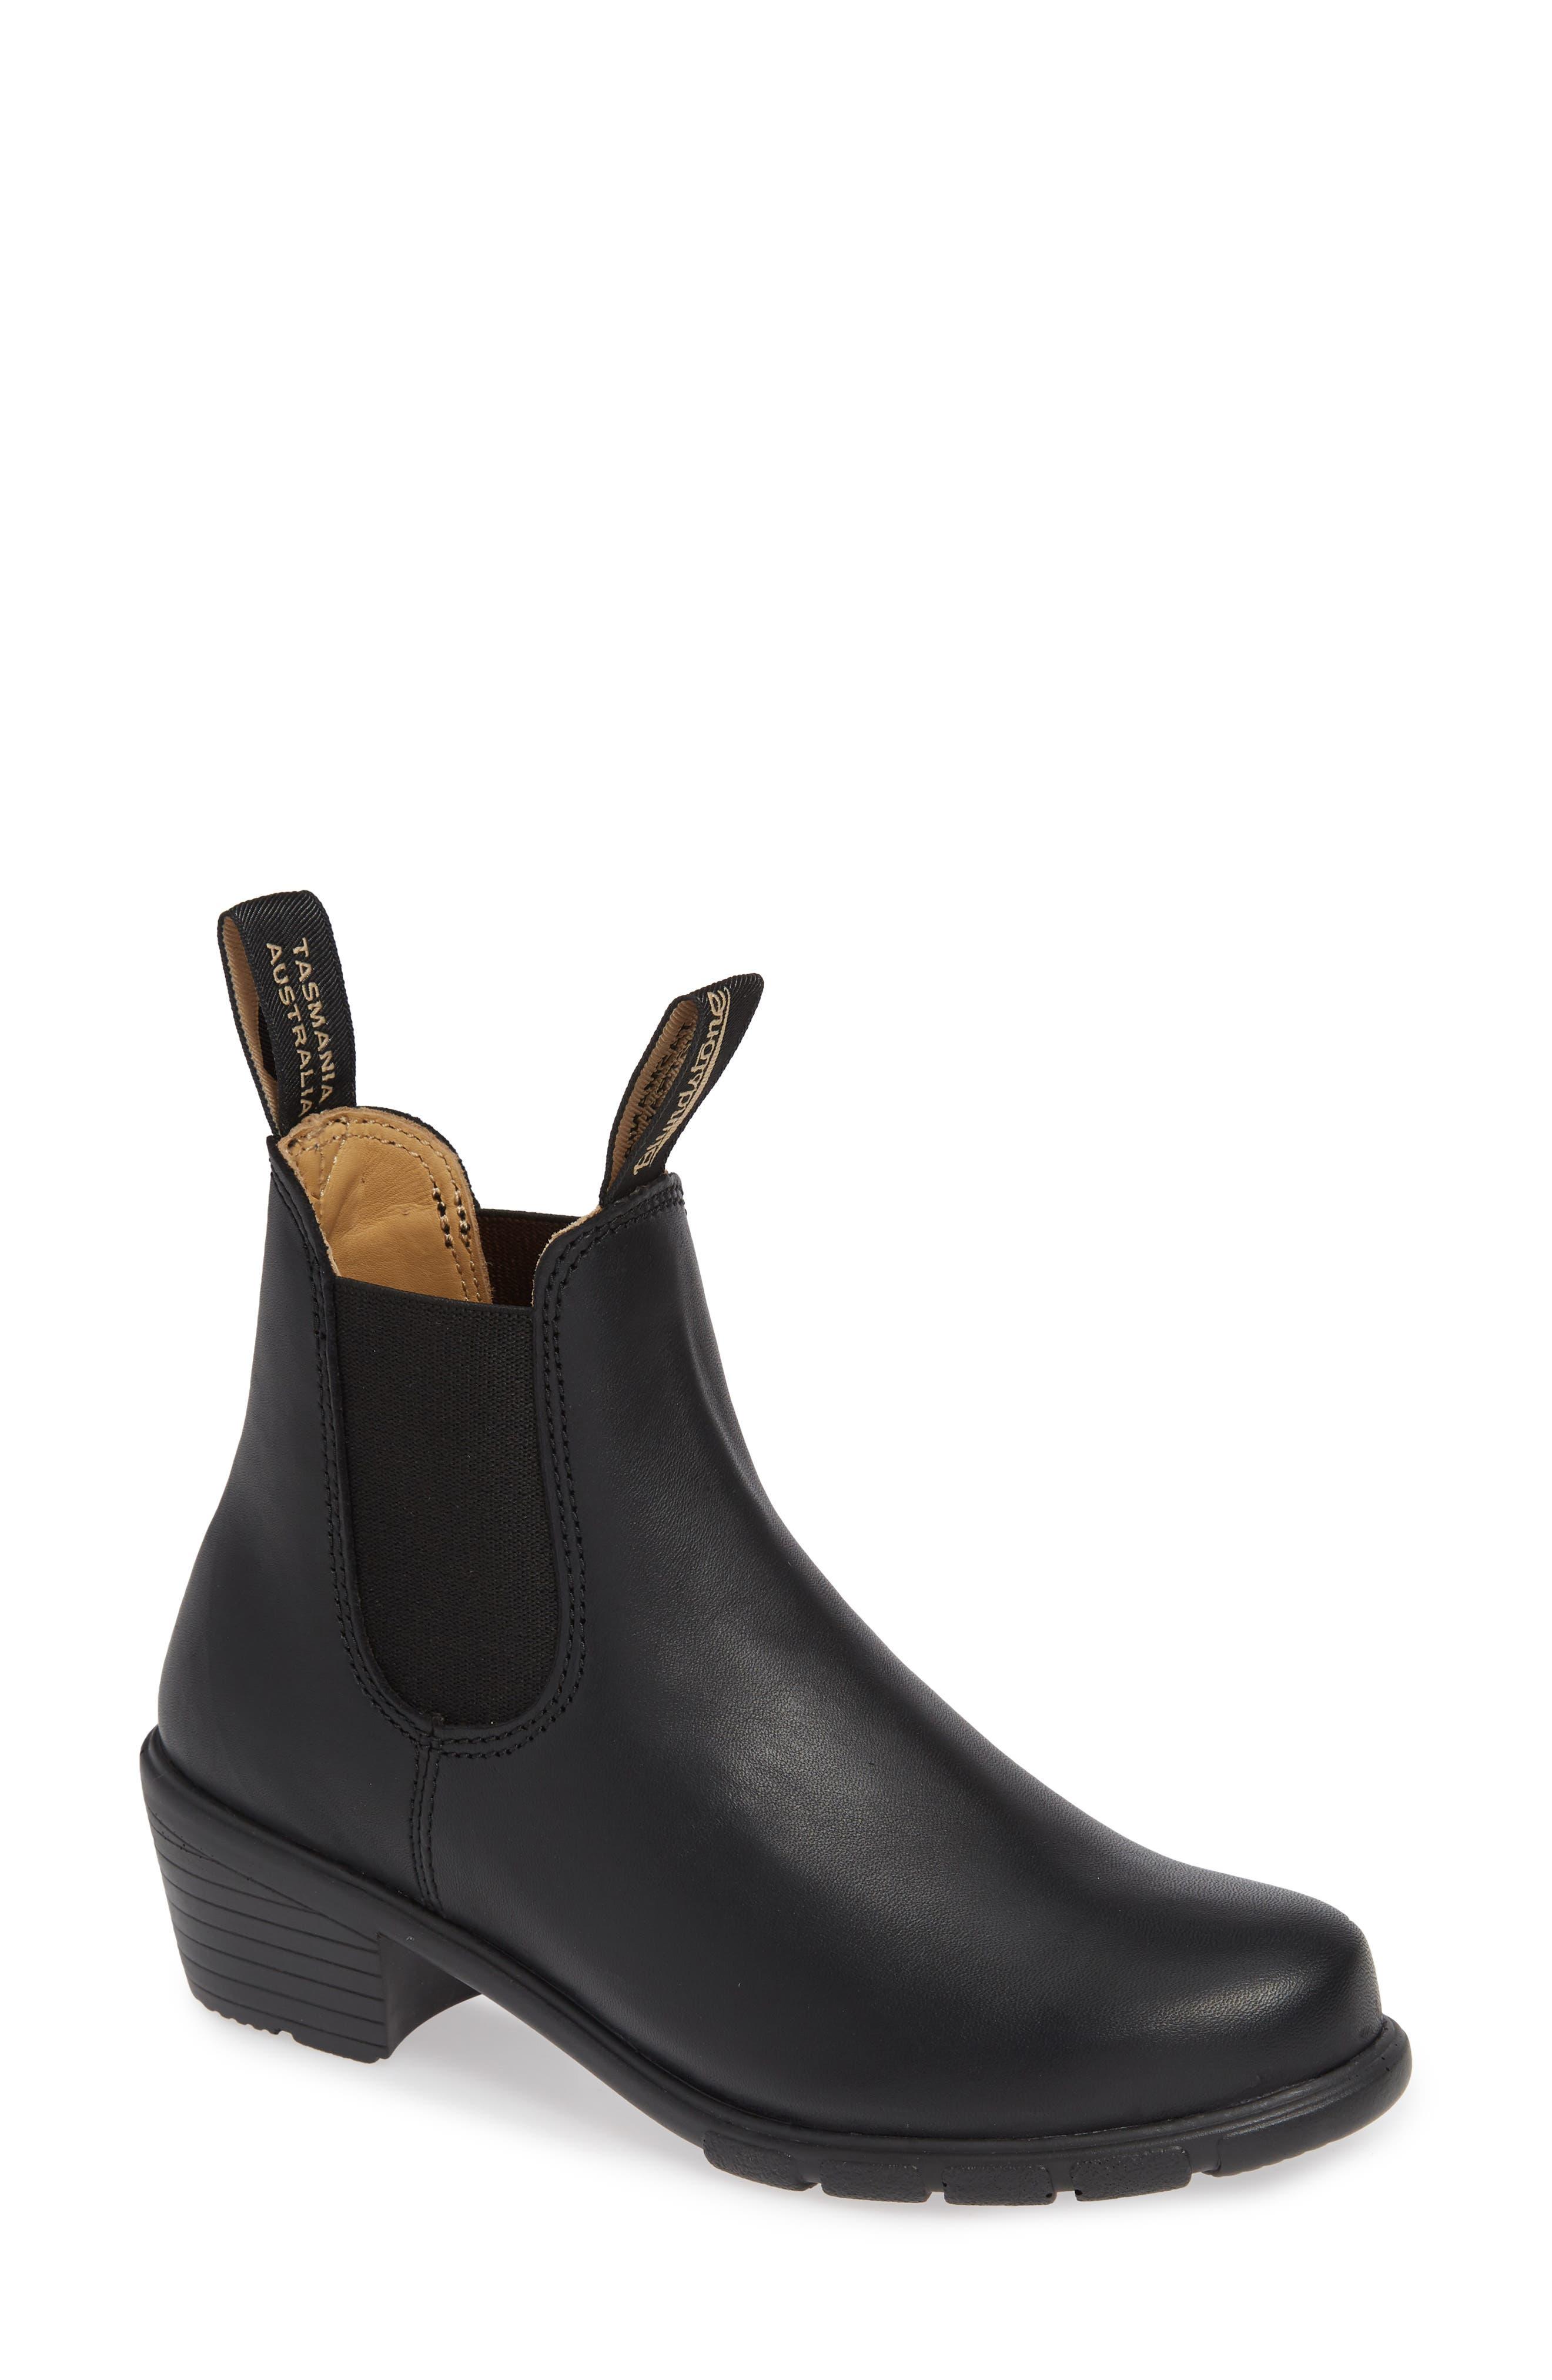 1671 Chelsea Boot,                             Main thumbnail 1, color,                             BLACK LEATHER